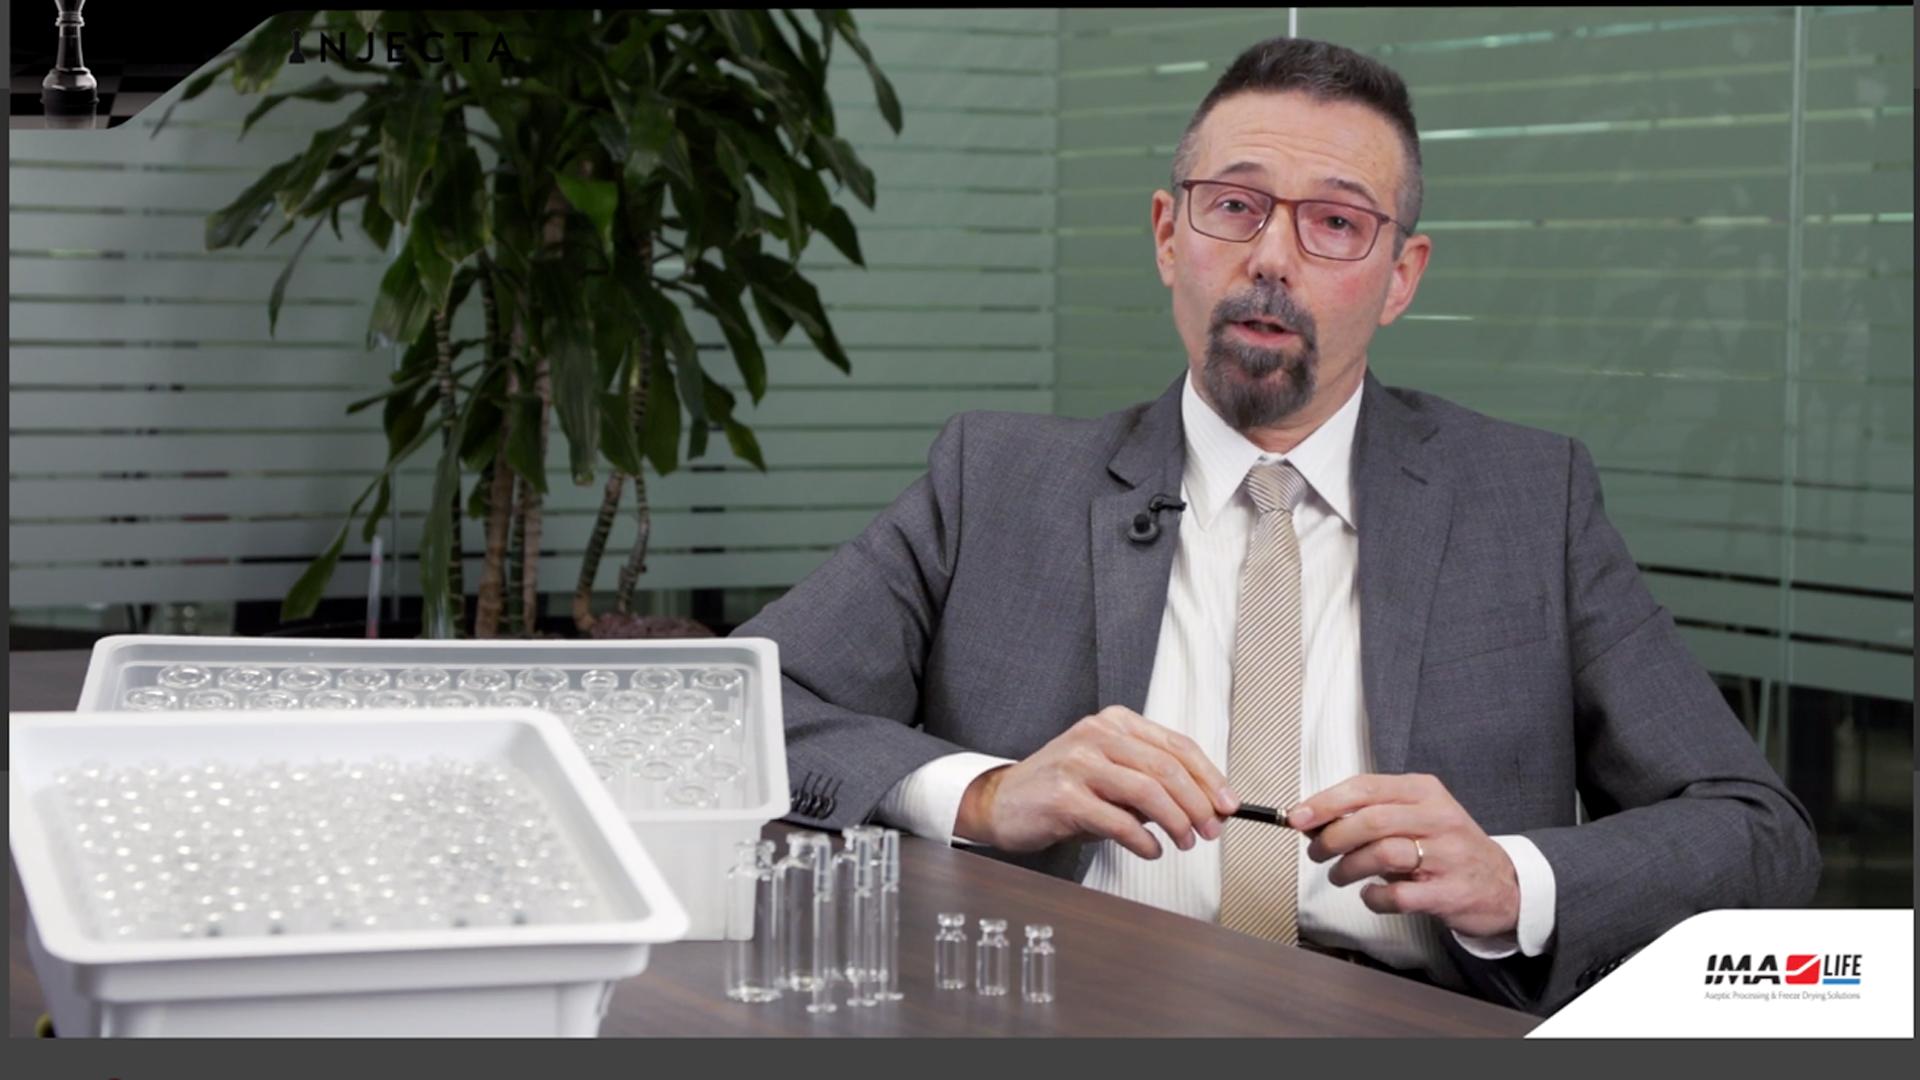 Watch the video interview with Flavio Brambilla